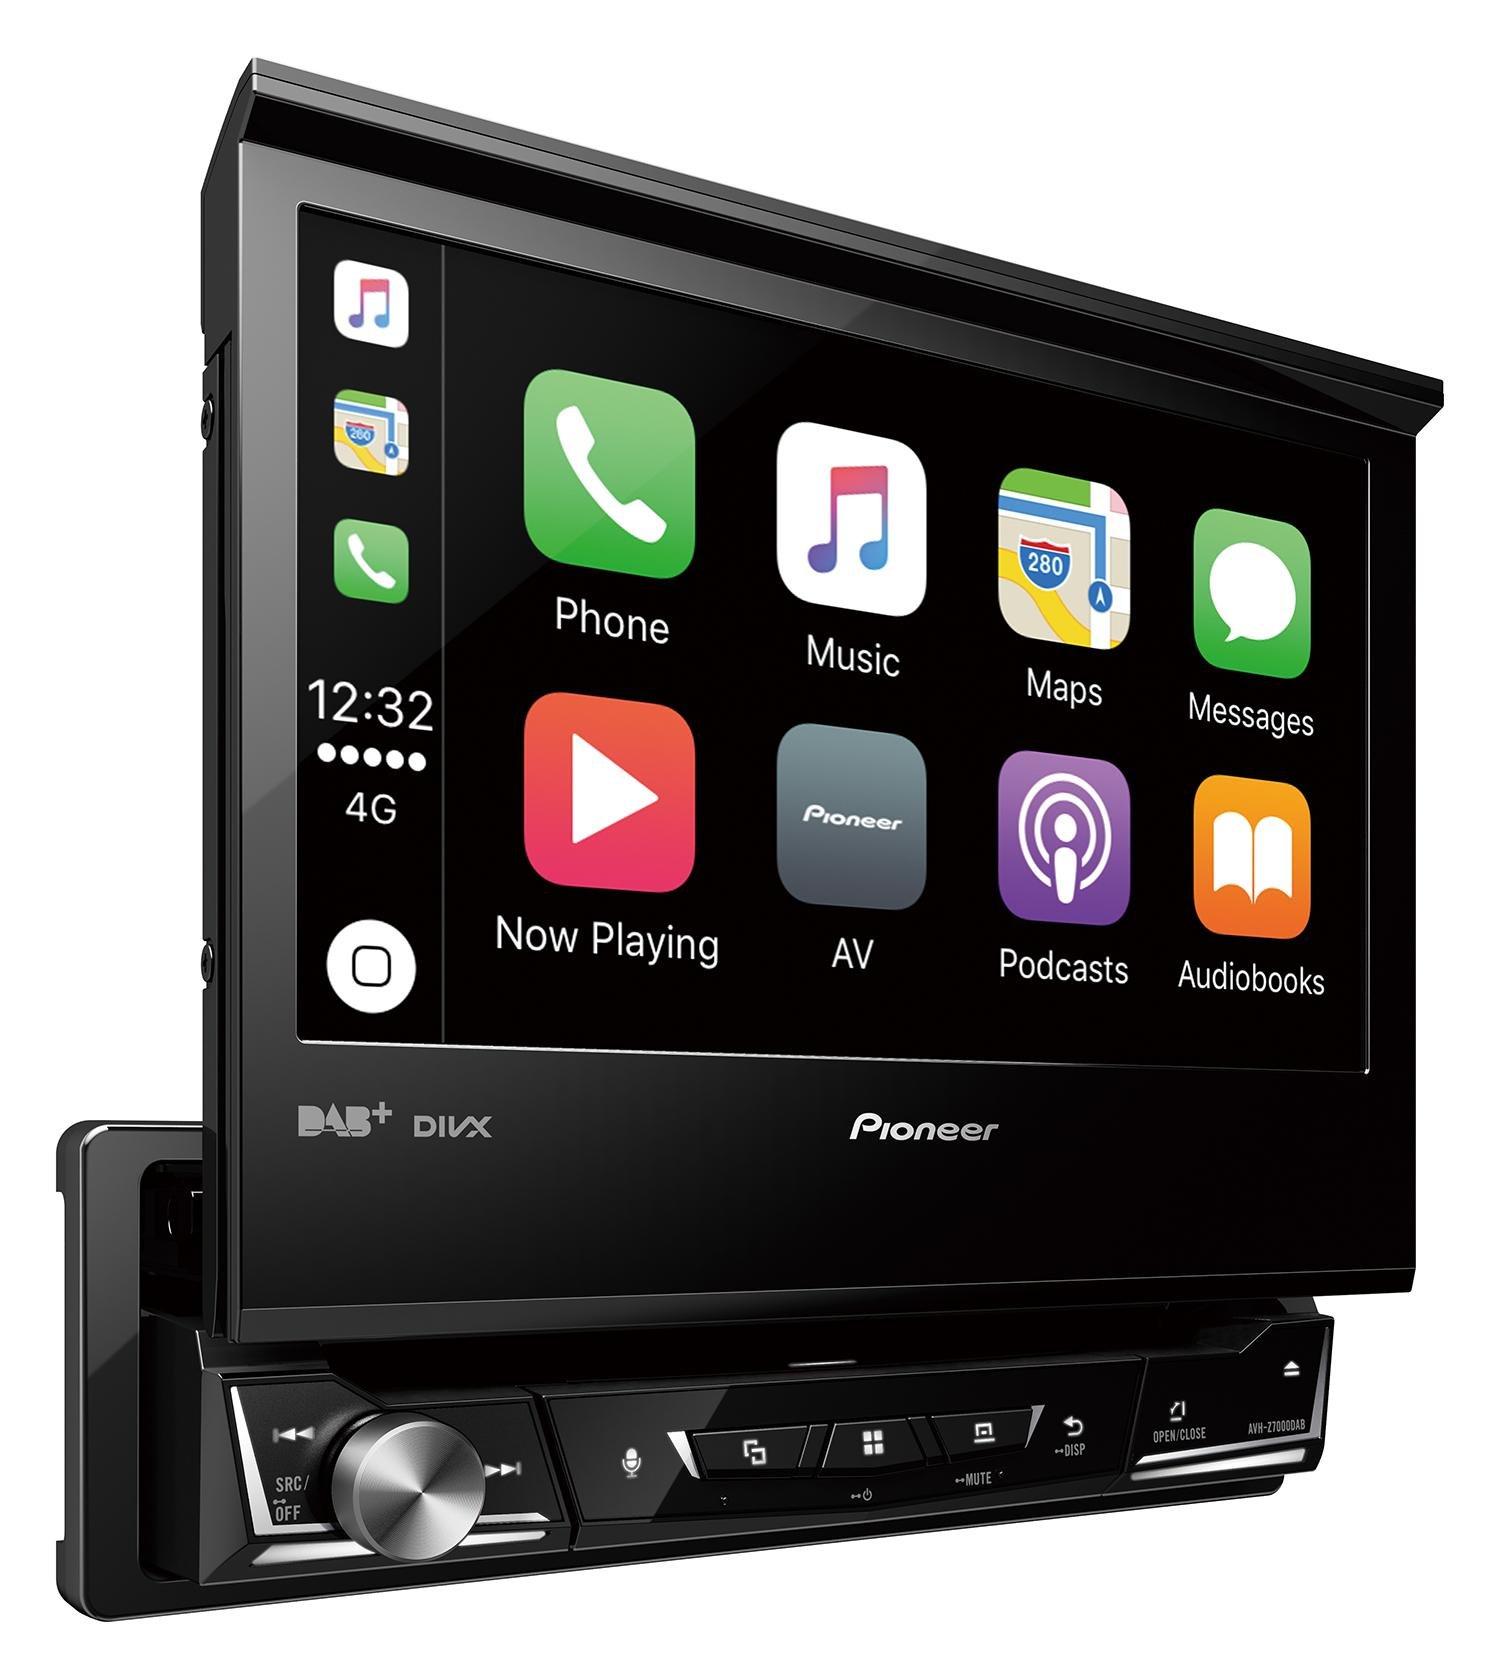 Mediacenter-Moniceiver-1-DIN-AVH-X7800BT-Pioneer-Radio-mit-ausfahrbarem-Bildschirm-7-Zoll-Touchscreen-Monitor